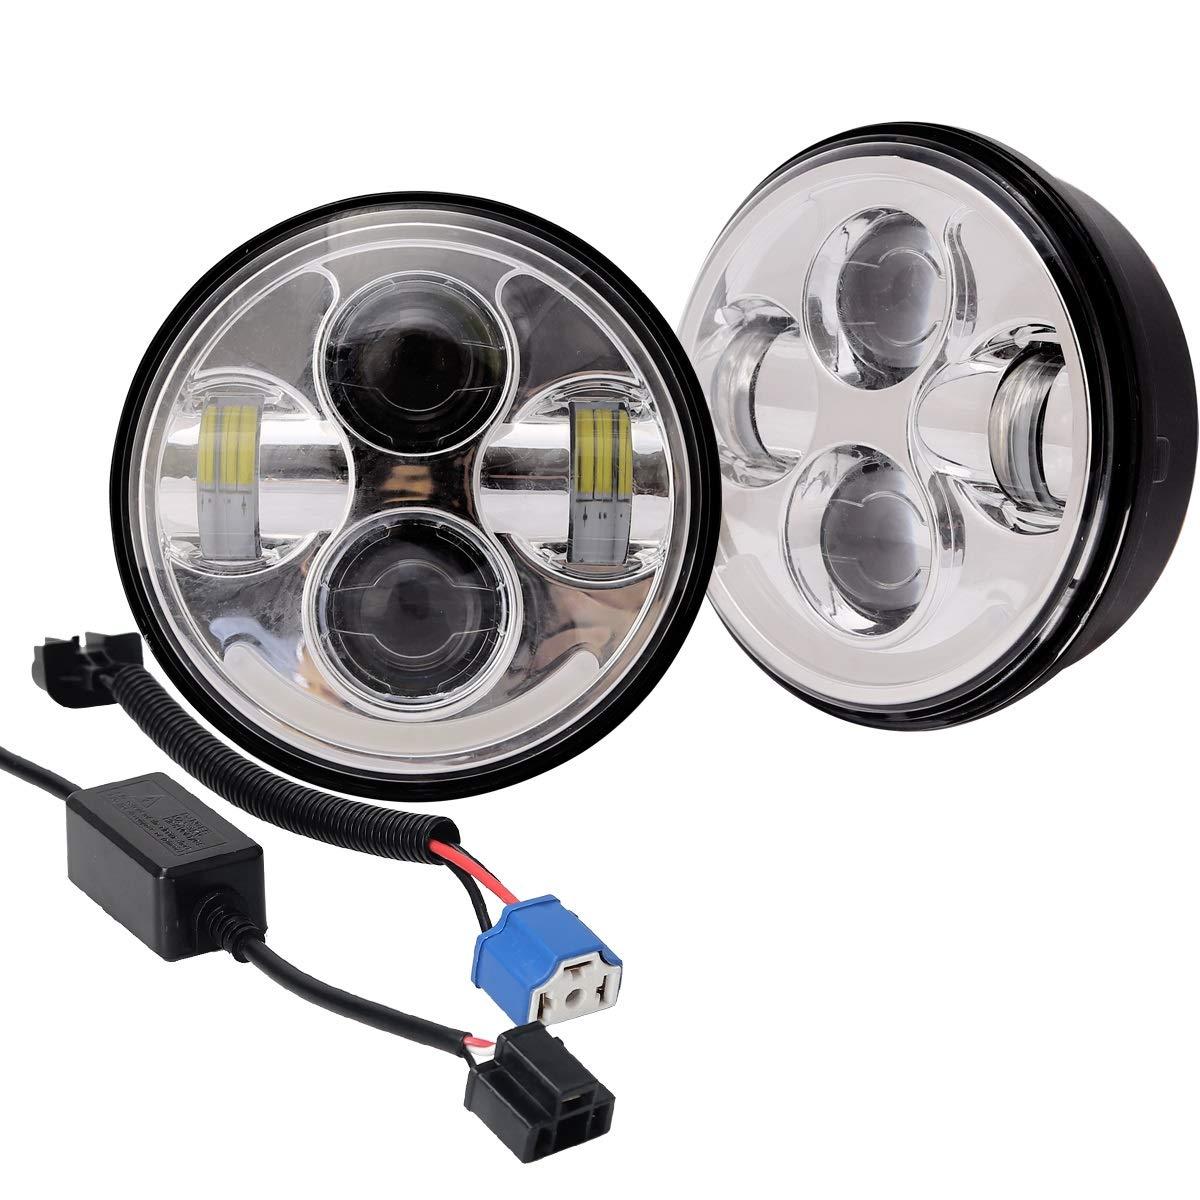 Man hongjia 5.75'' Round Black LED Headlight with High Low Beam White DRL Amber Turn Signal for Jeep Wrangler JK TJ LJ CJ Hummer (Style : DDL-5.7R-001)